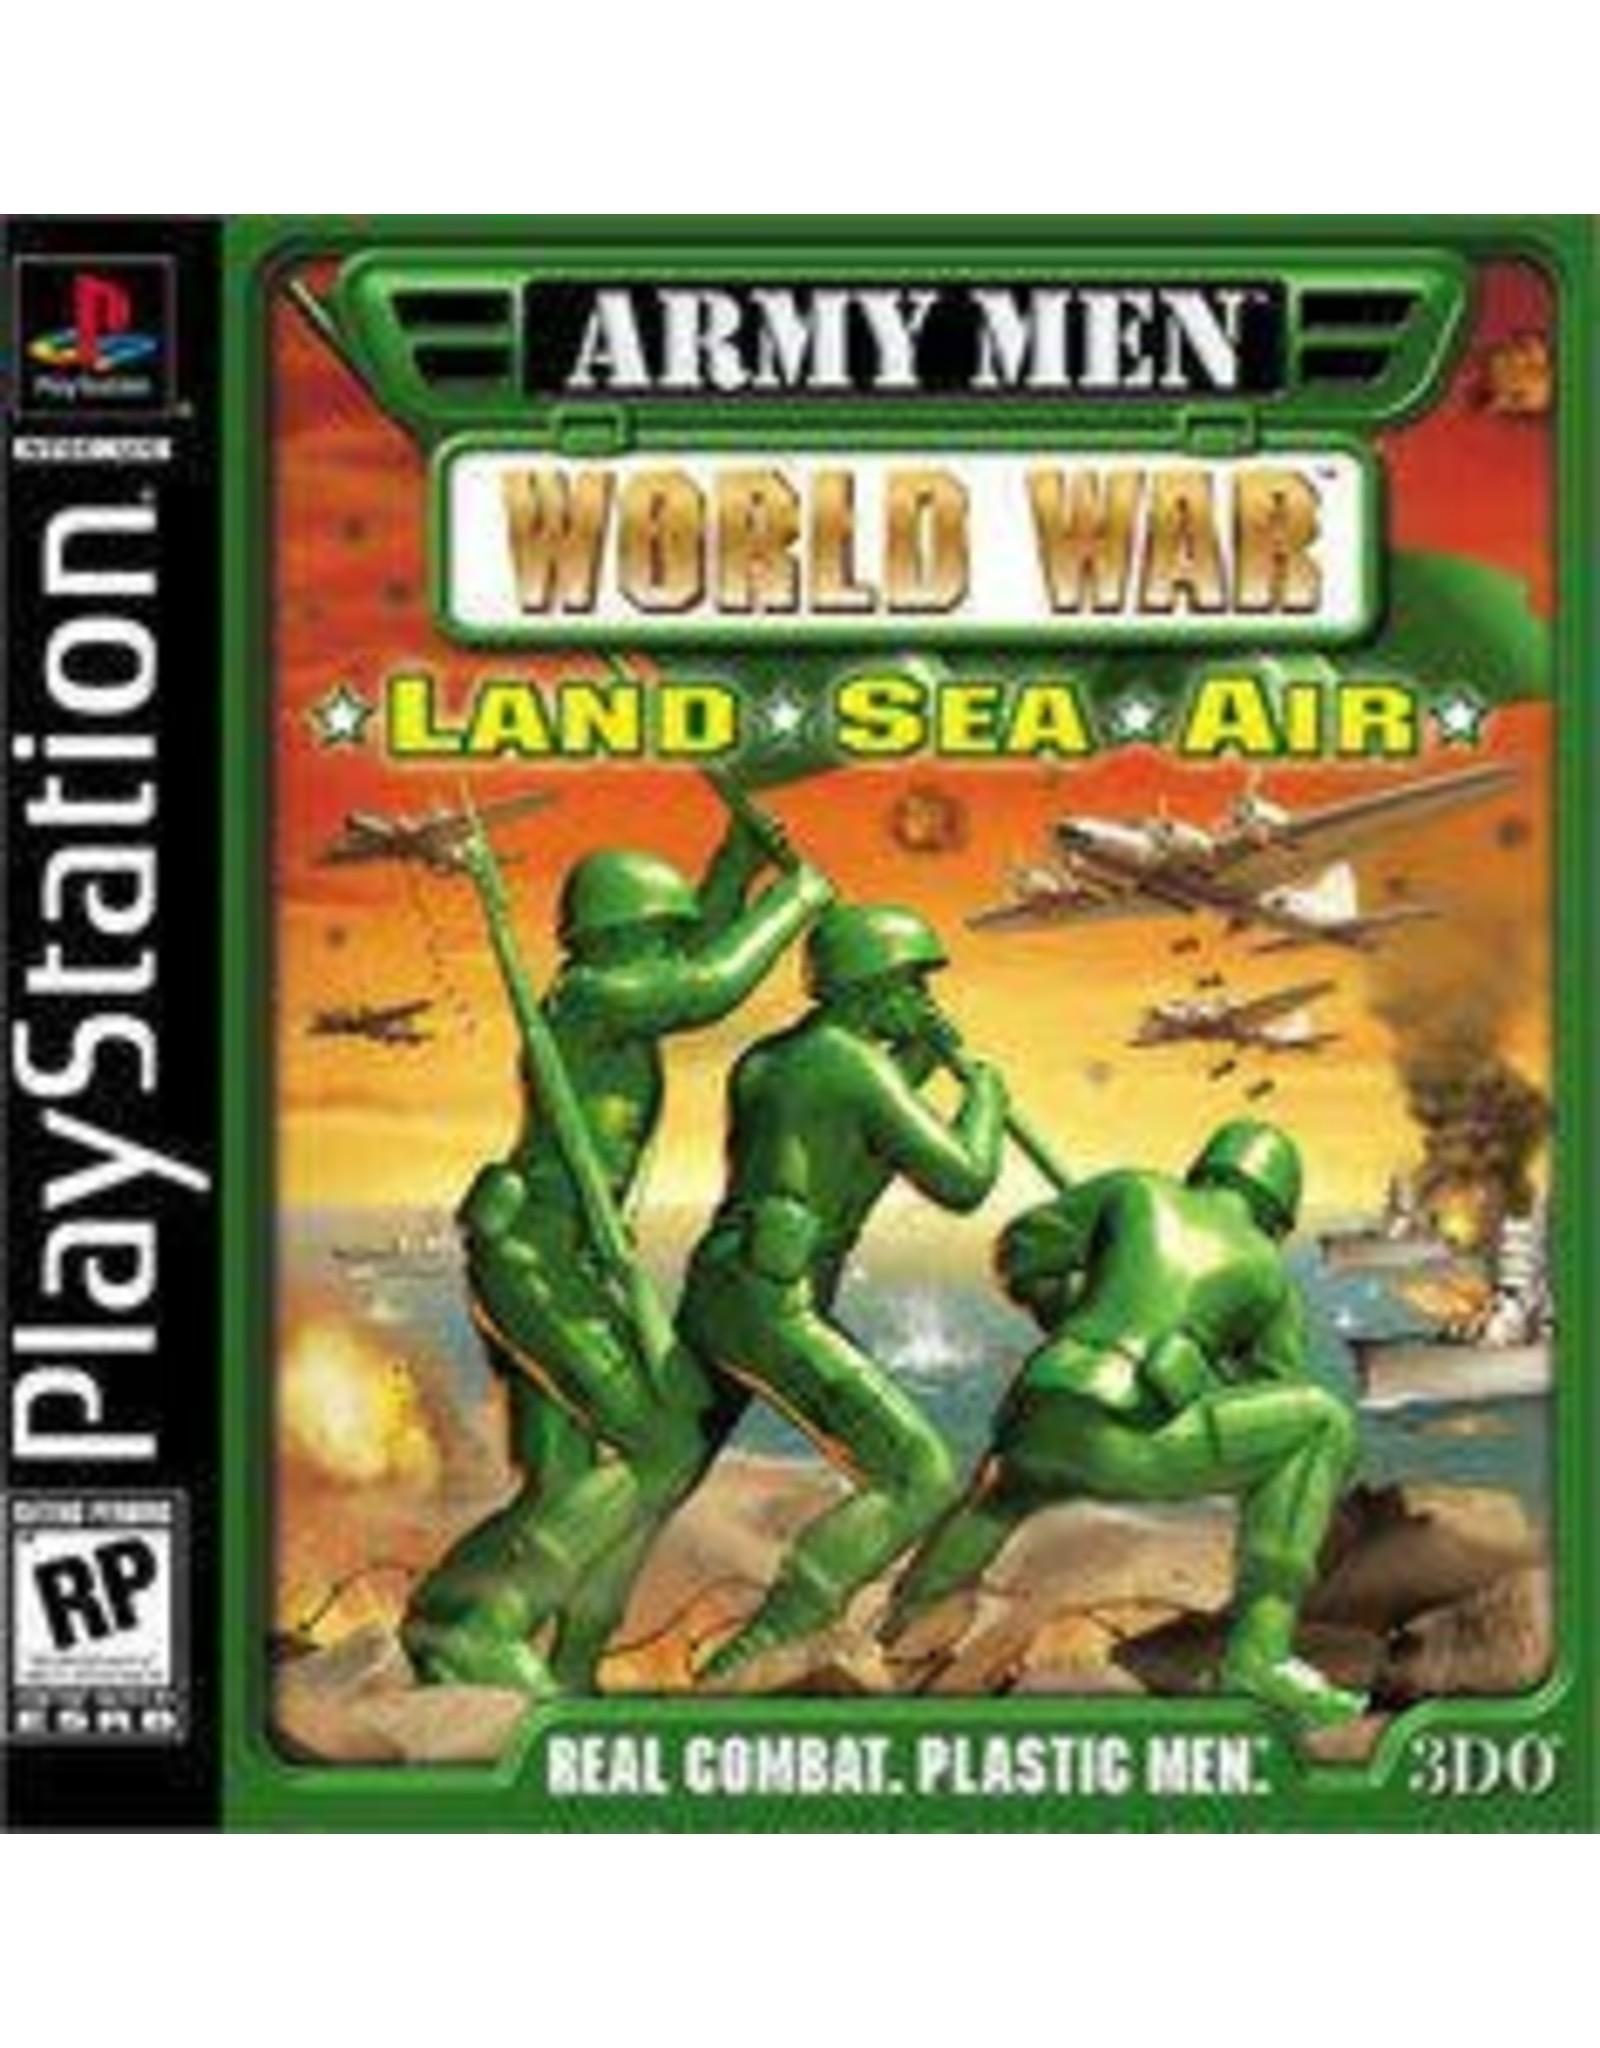 Playstation Army Men World War Land Sea Air (CiB)